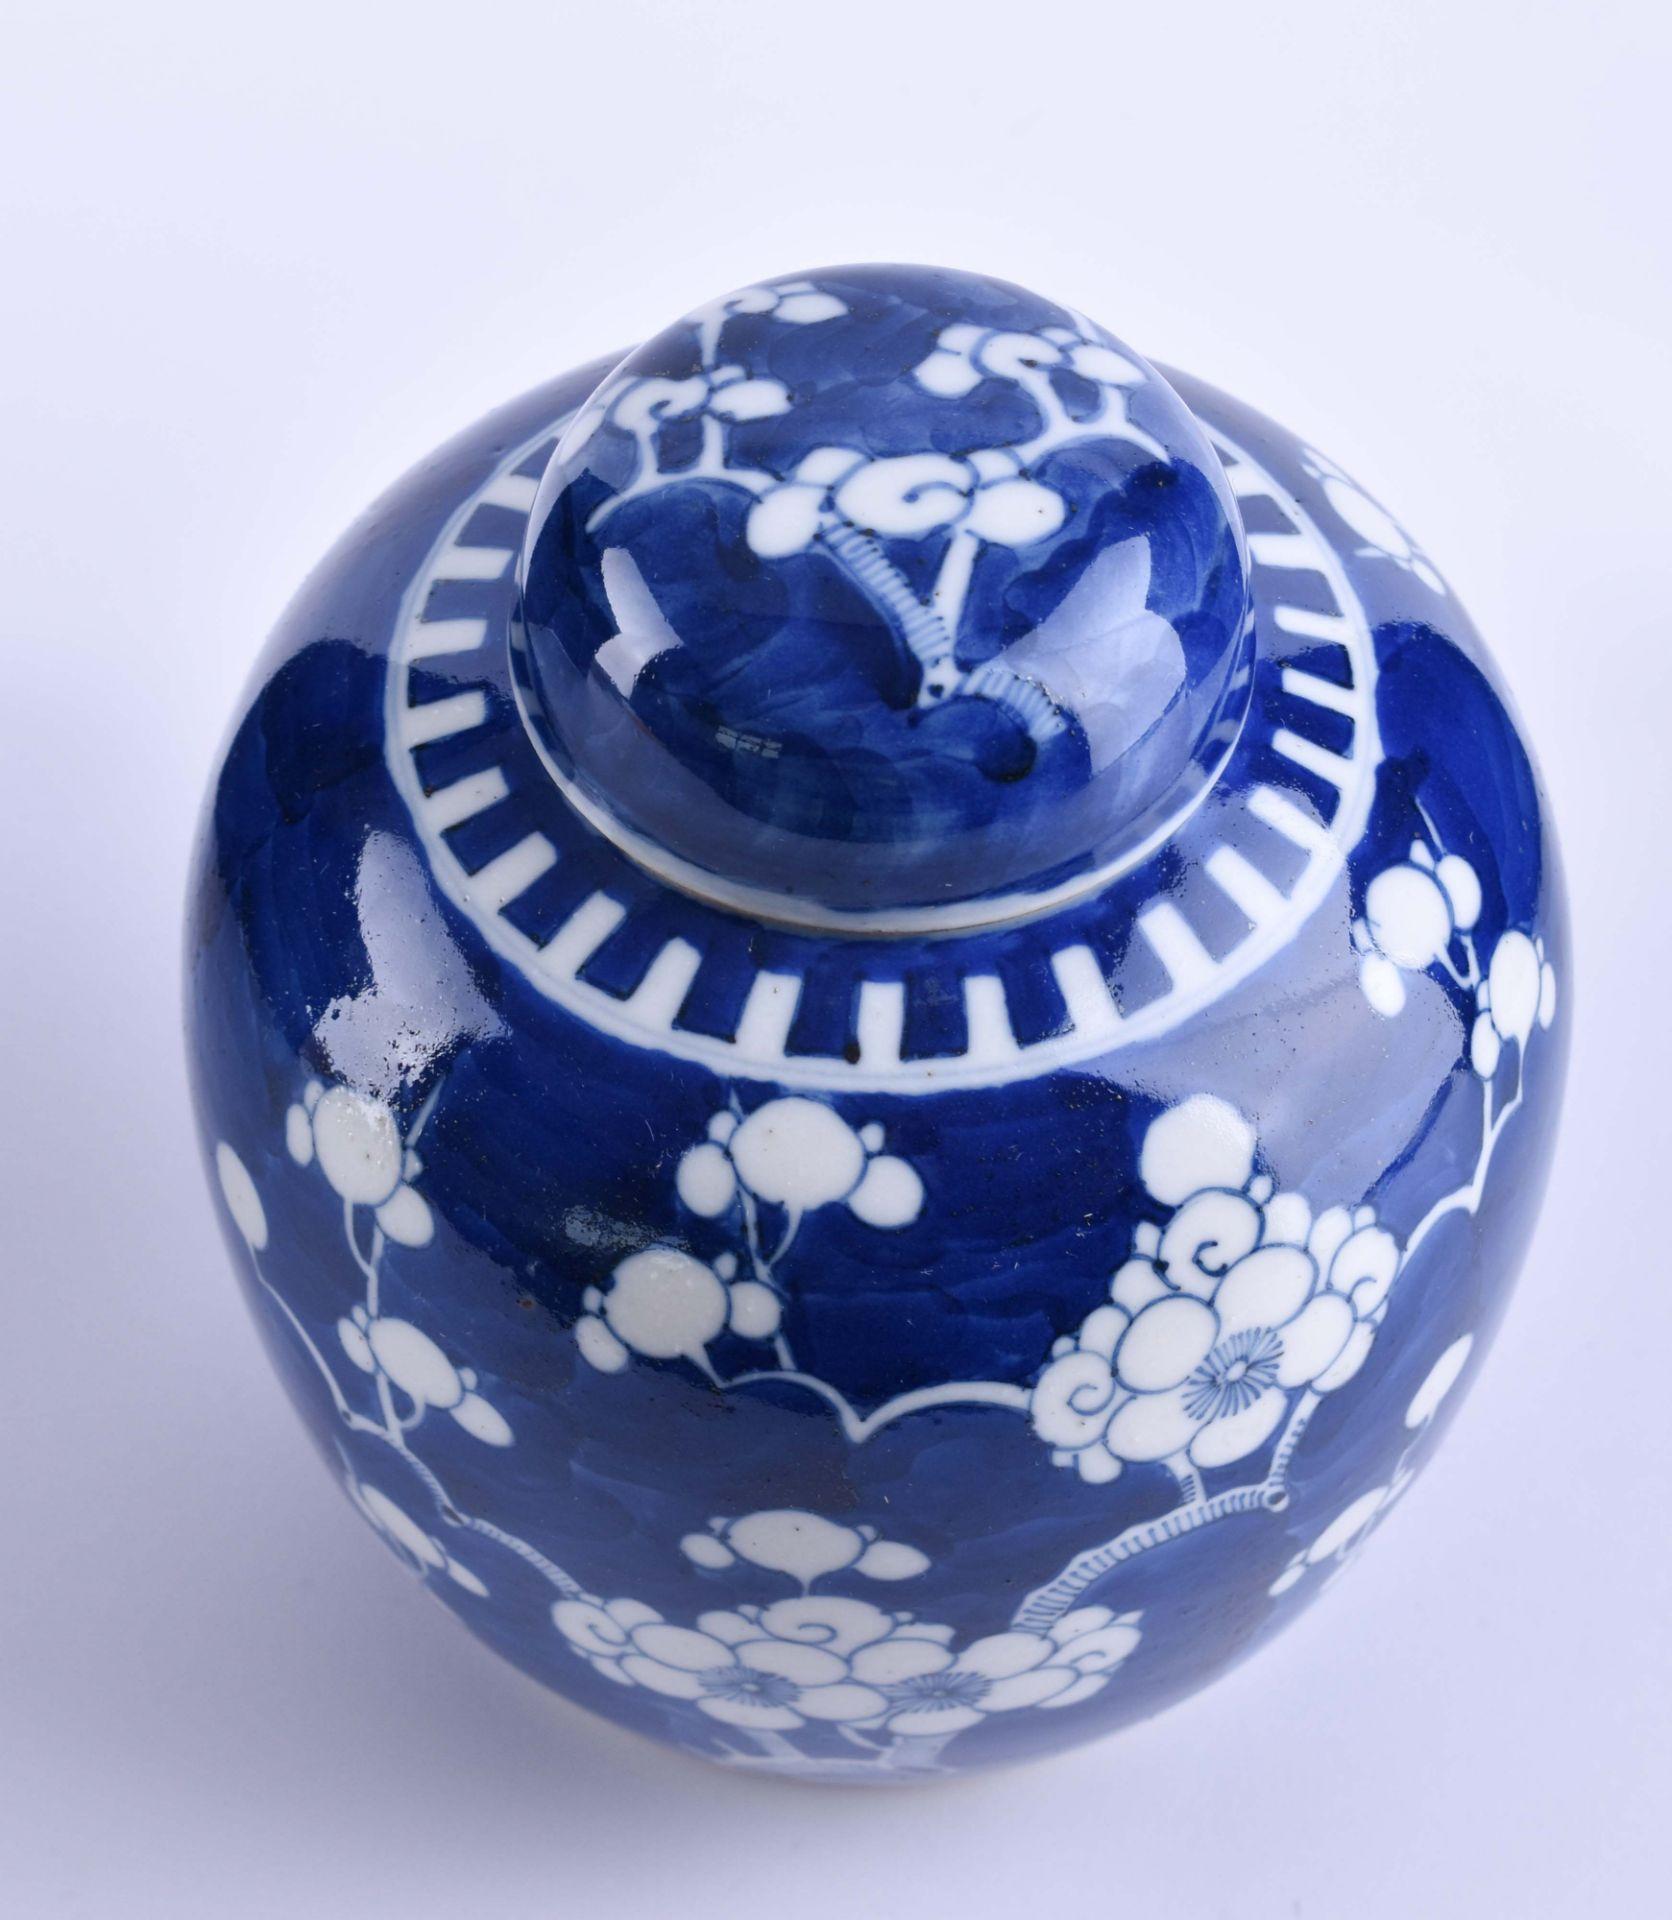 Ginger pot China Qing period - Image 2 of 7